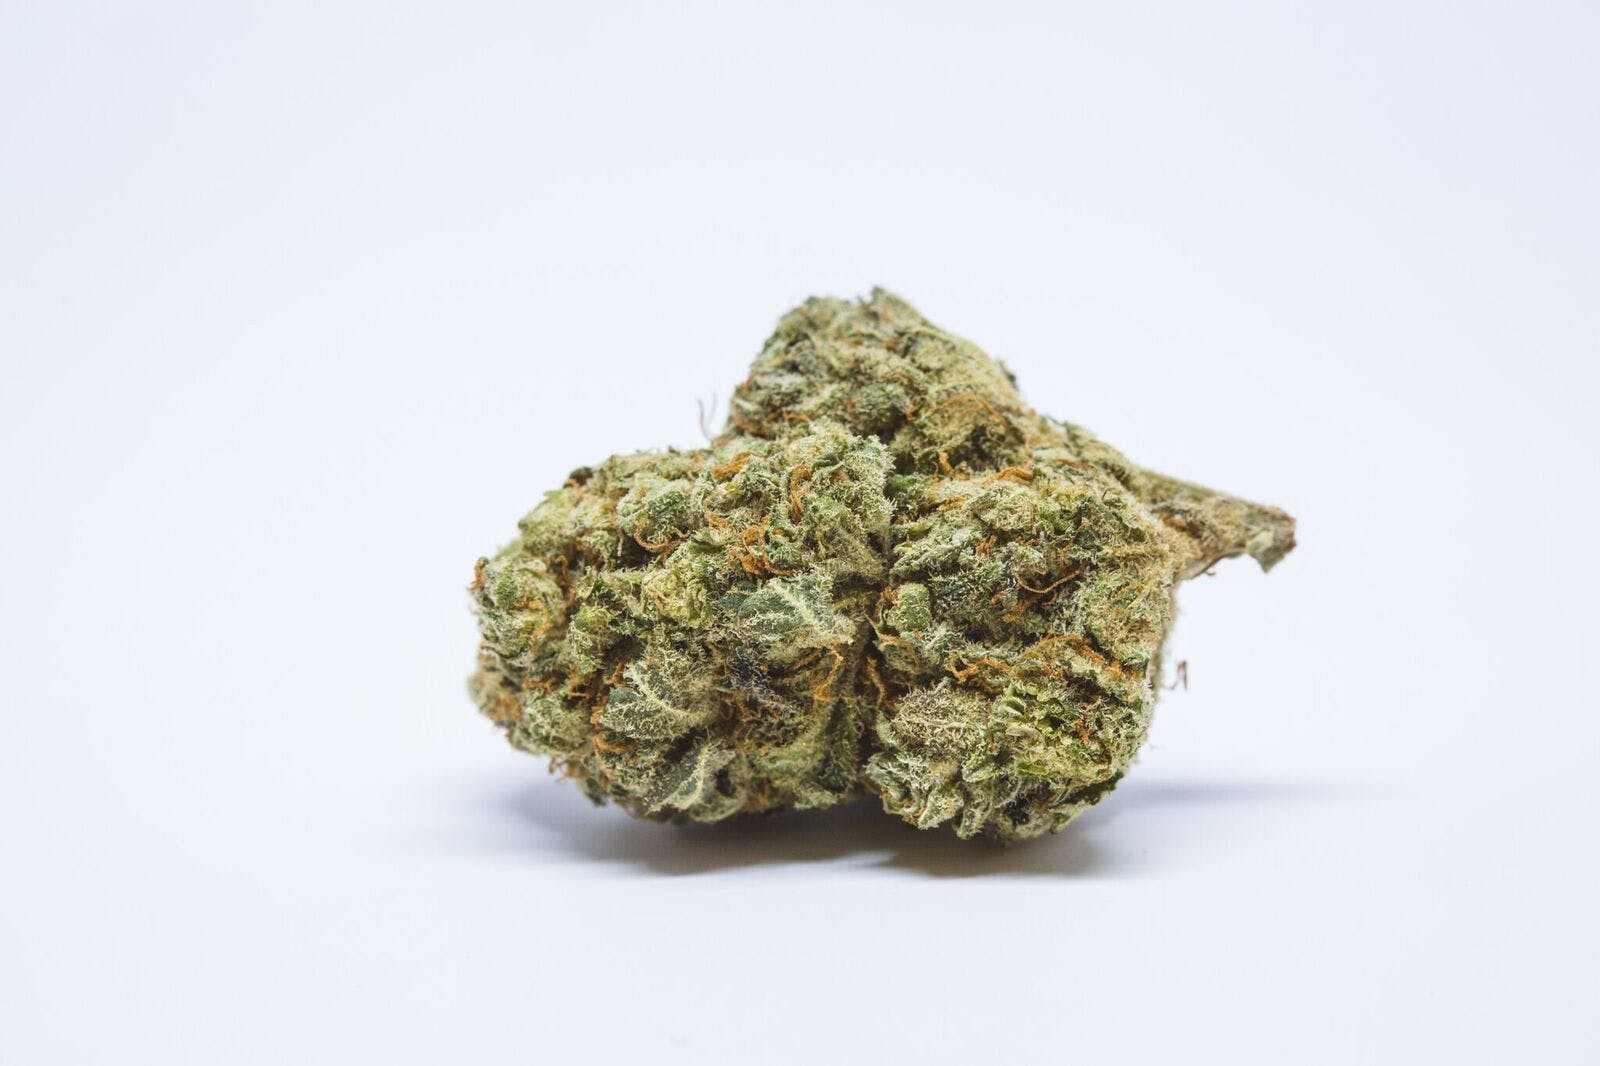 Apollo 11 Weed; Apollo 11 Cannabis Strain; Apollo 11 Hybrid Marijuana Strain